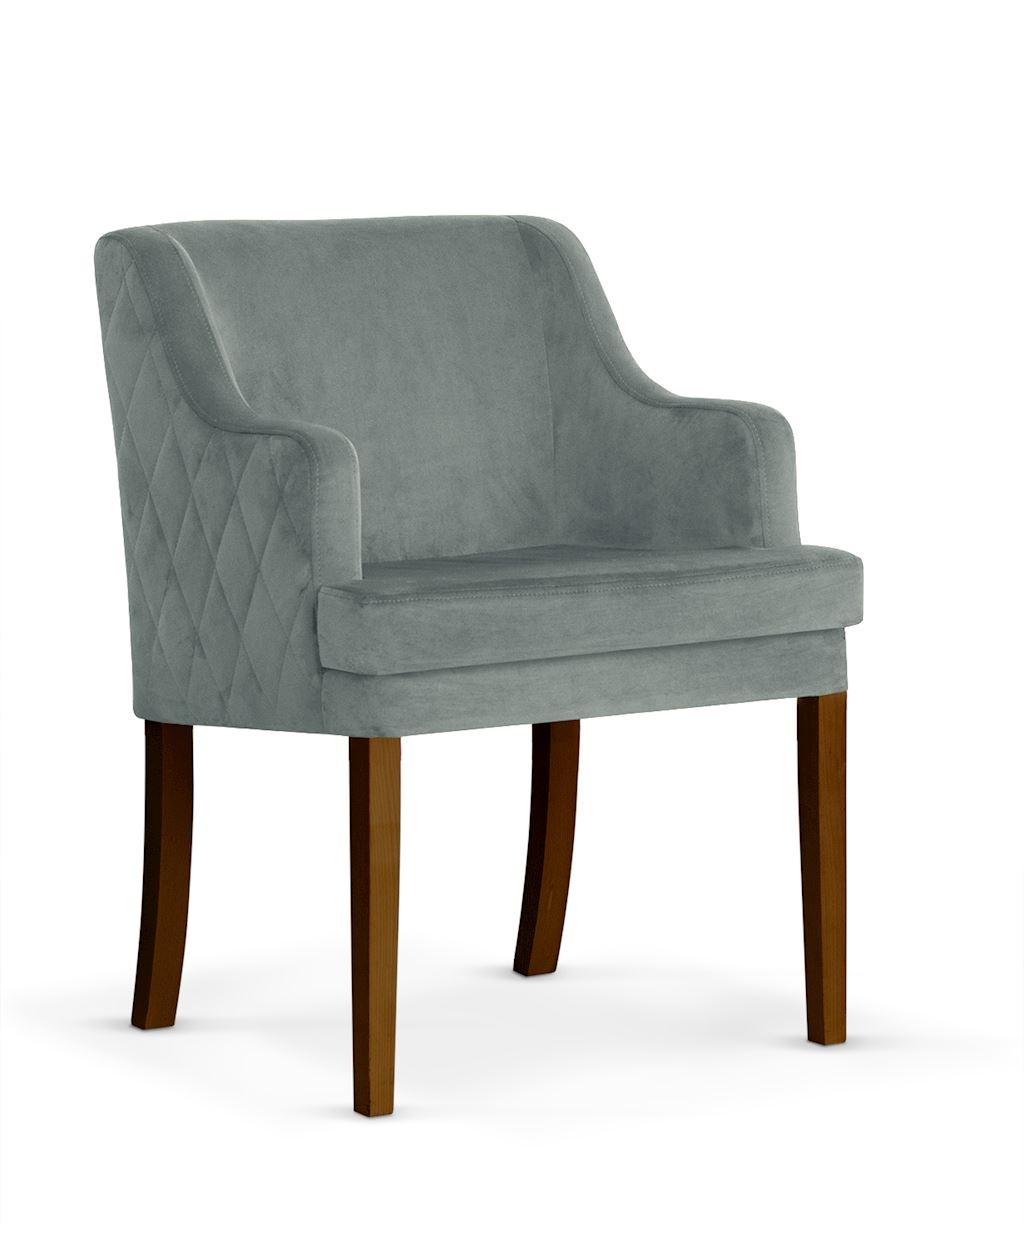 Fotoliu fix tapitat cu stofa, cu picioare din lemn Grand Grey / Walnut, l58xA60xH89 cm